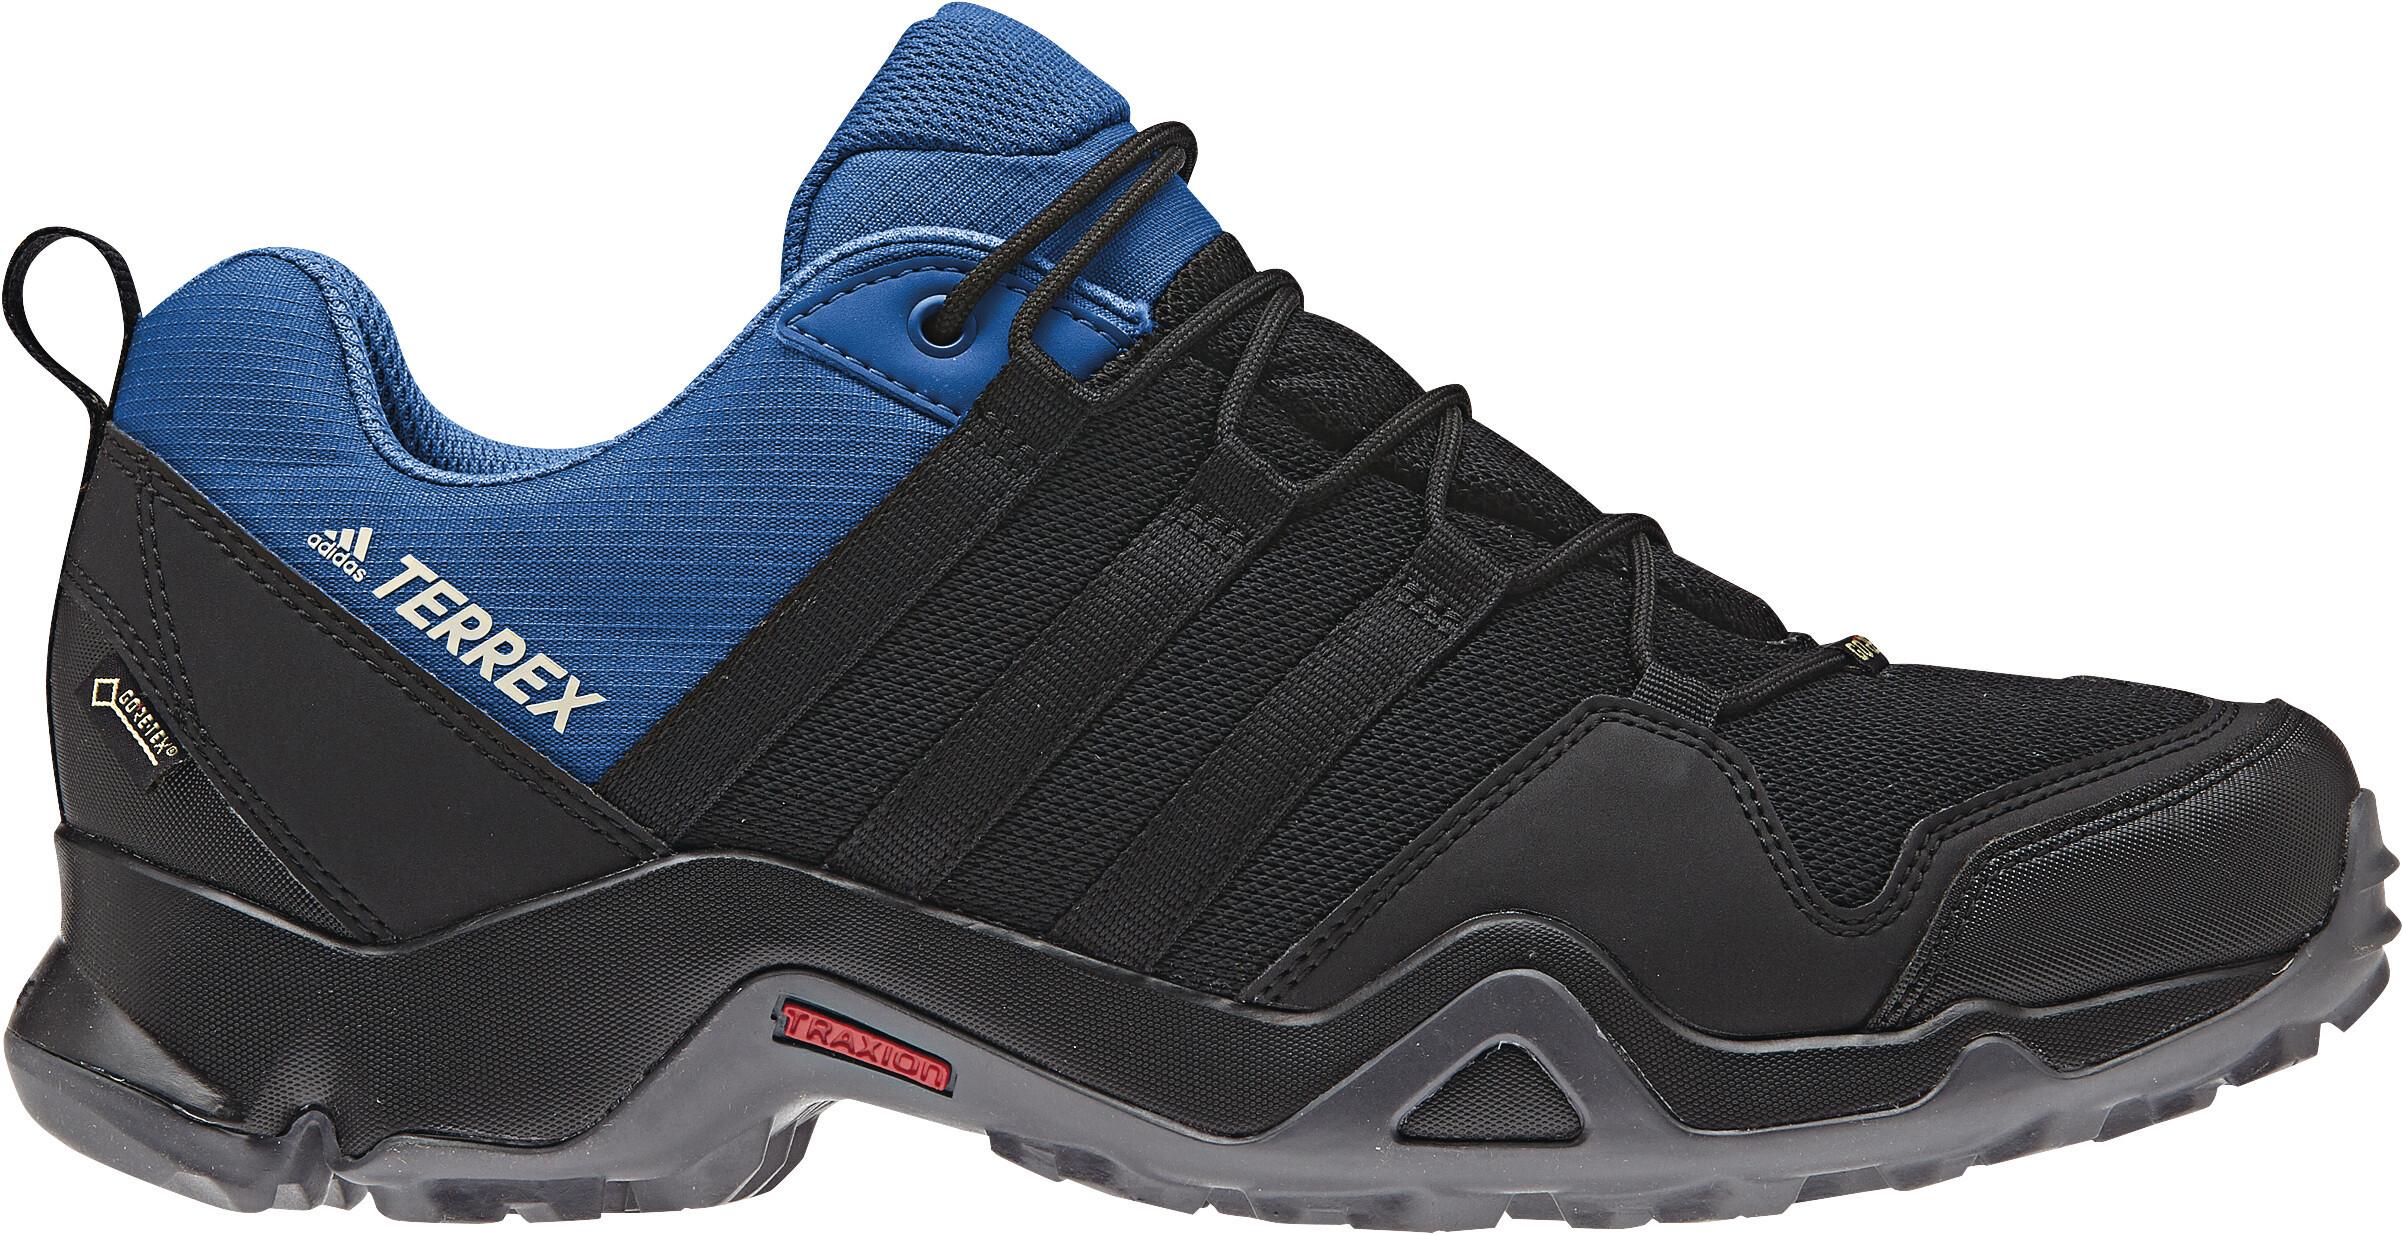 competitive price d3d3c 5db8d adidas TERREX AX2R GTX - Chaussures Homme - bleu noir